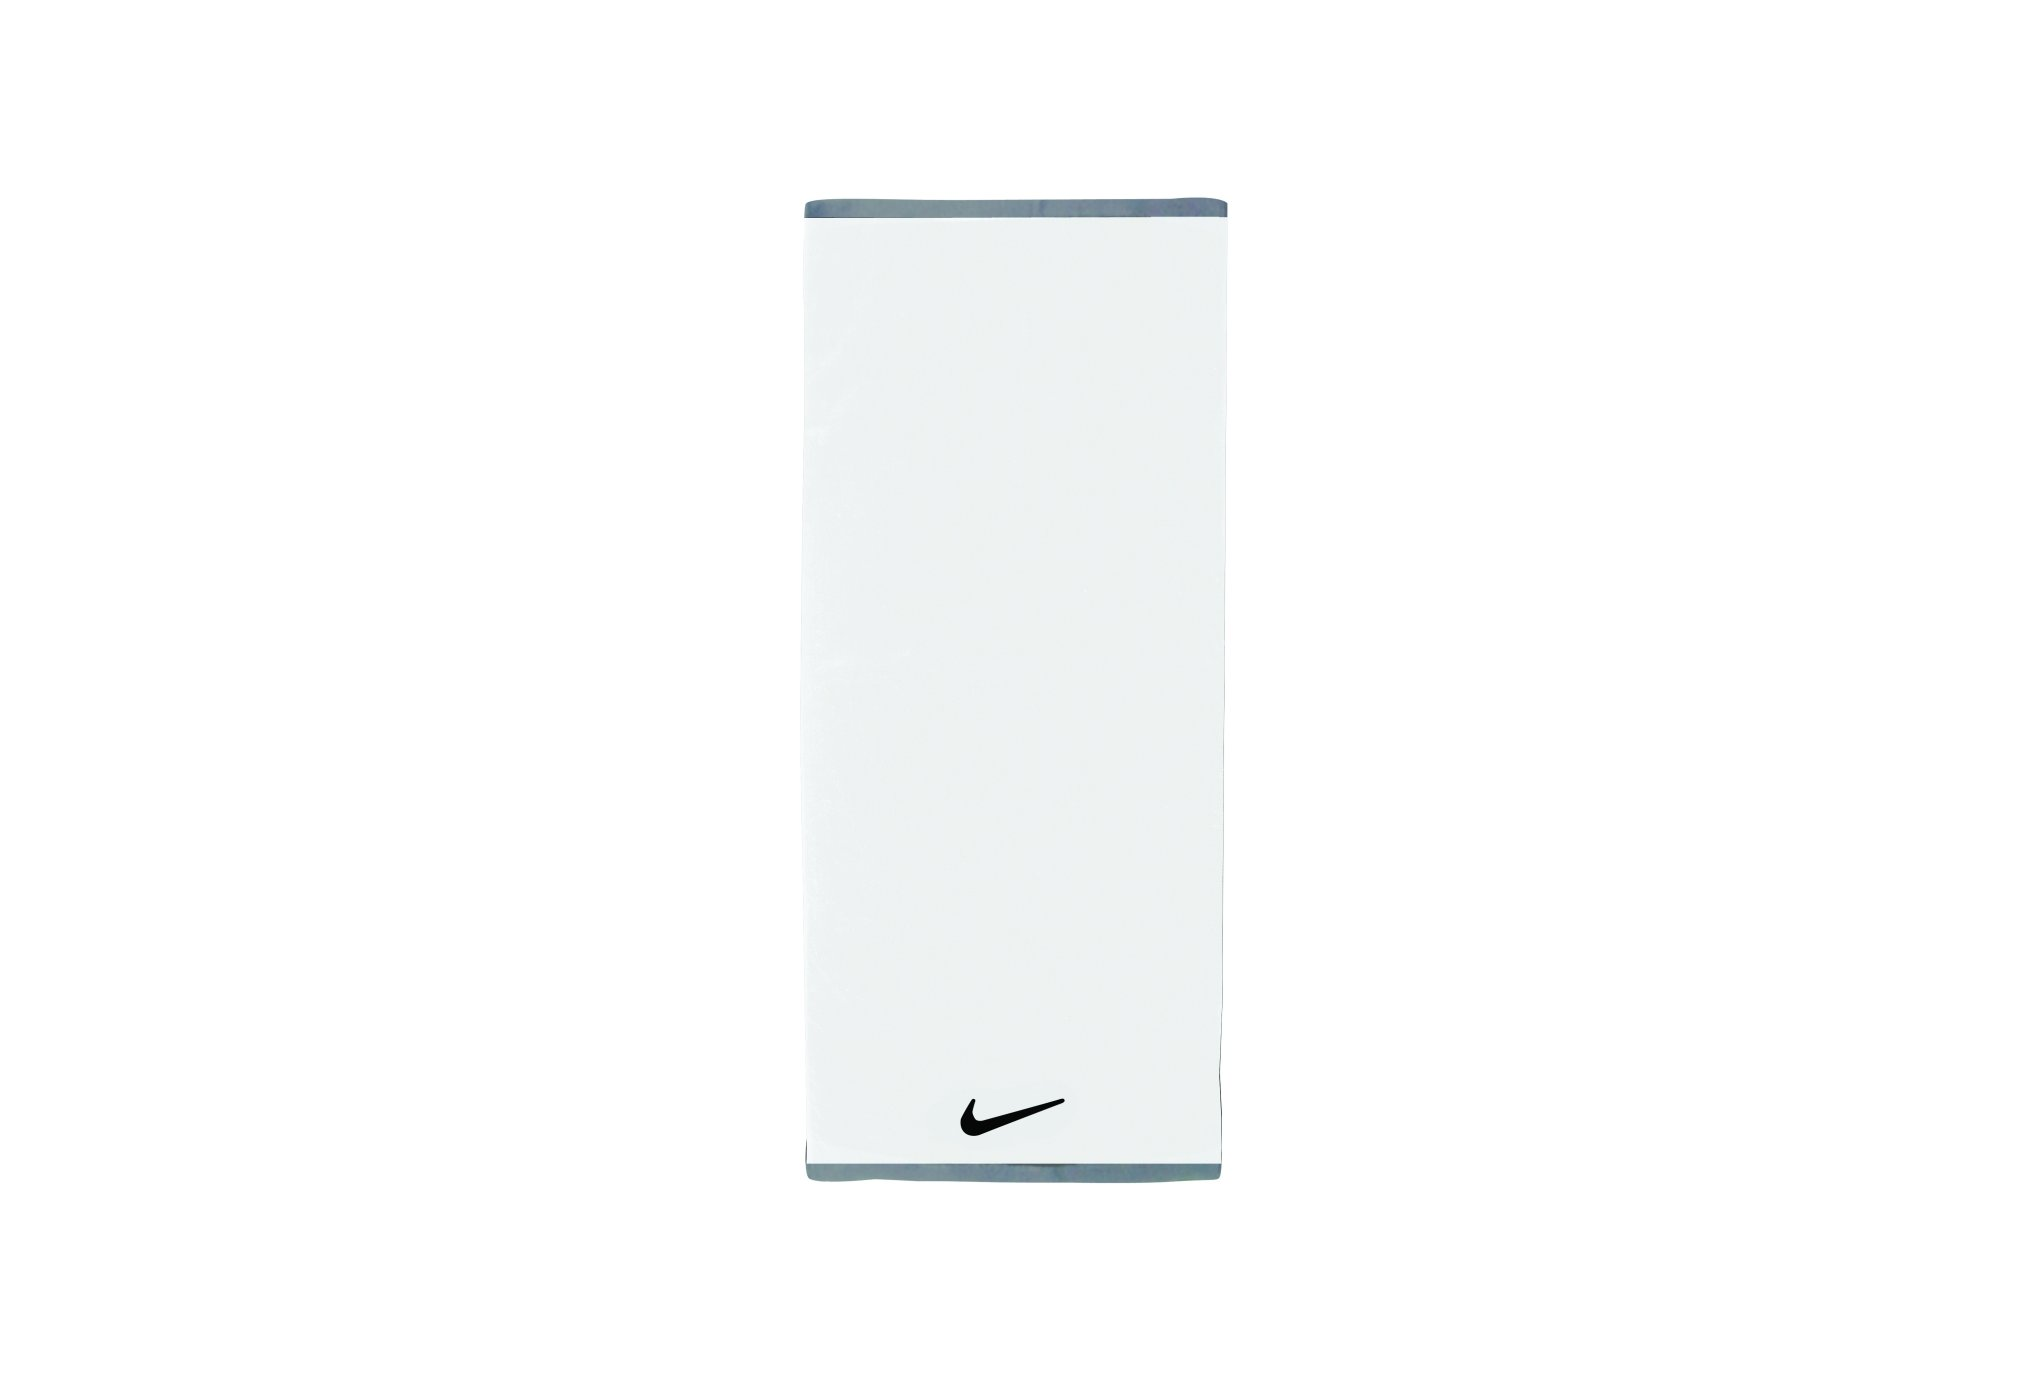 Nike Fundamental towel - l training